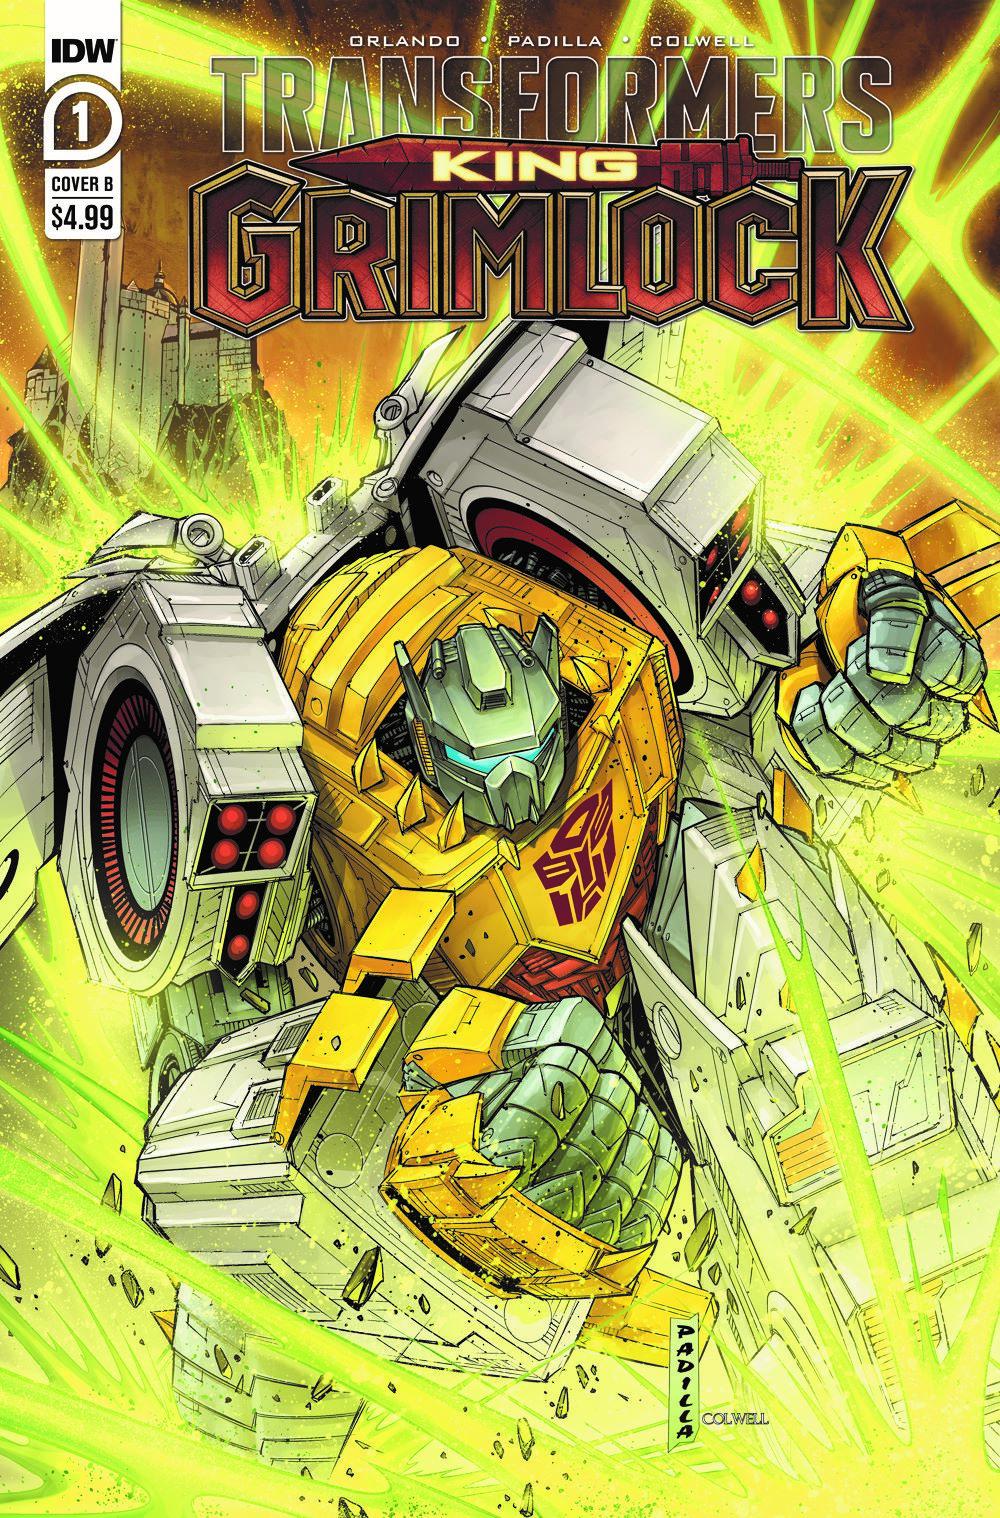 TFGrimlock-01-Cover-B ComicList Previews: TRANSFORMERS KING GRIMLOCK #1 (OF 5)